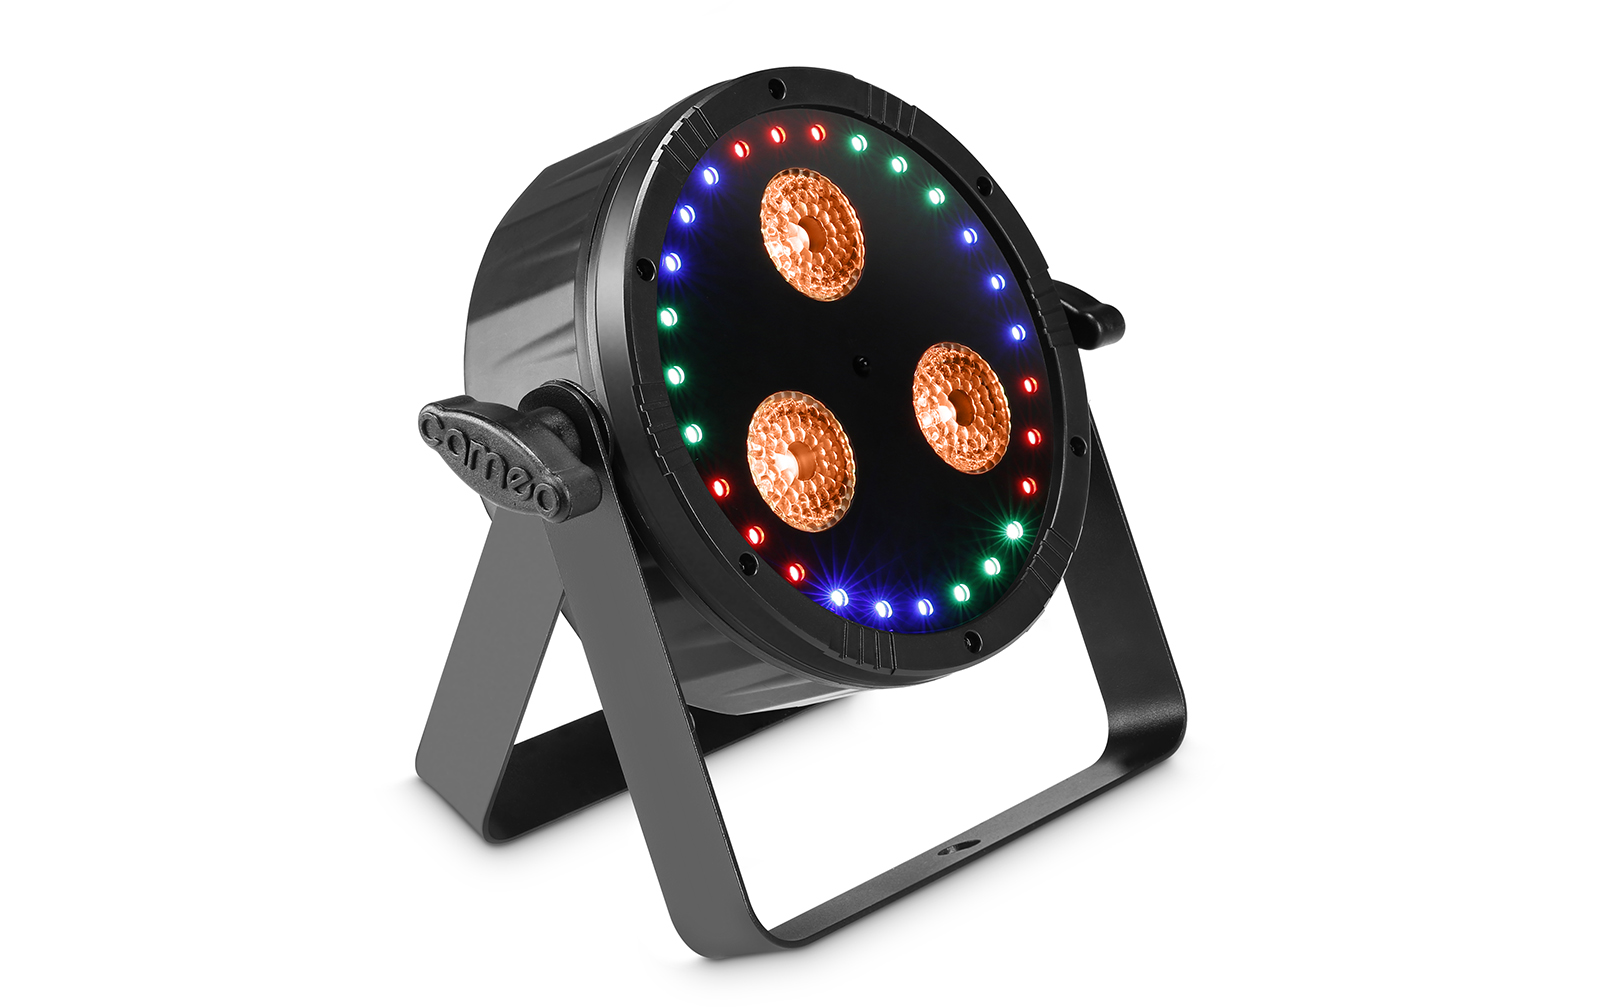 cameo-flat-star-flacher-2-in-1-par-scheinwerfer-mit-rgbwa-uv-leds-und-rgb-ring